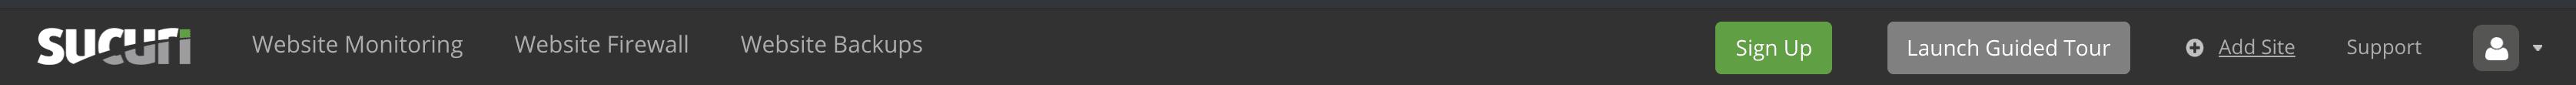 Screenshot navigation